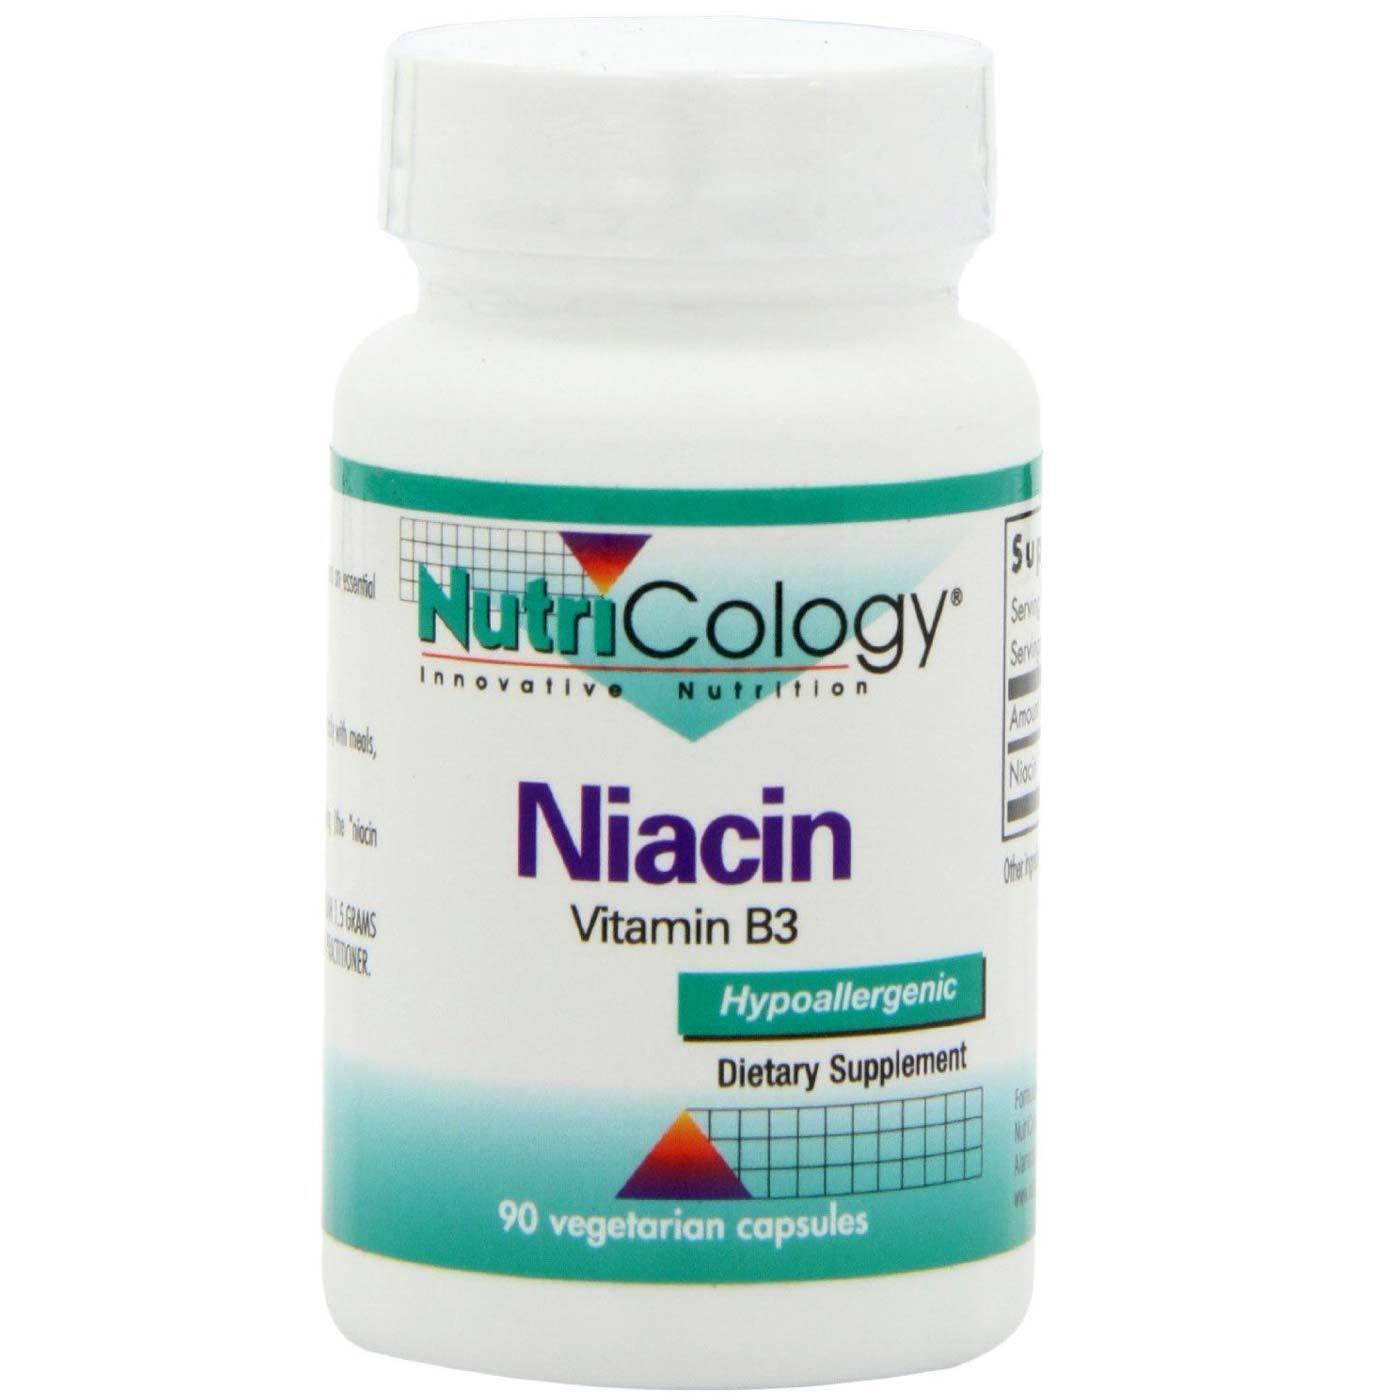 Vitamin b3 supplements